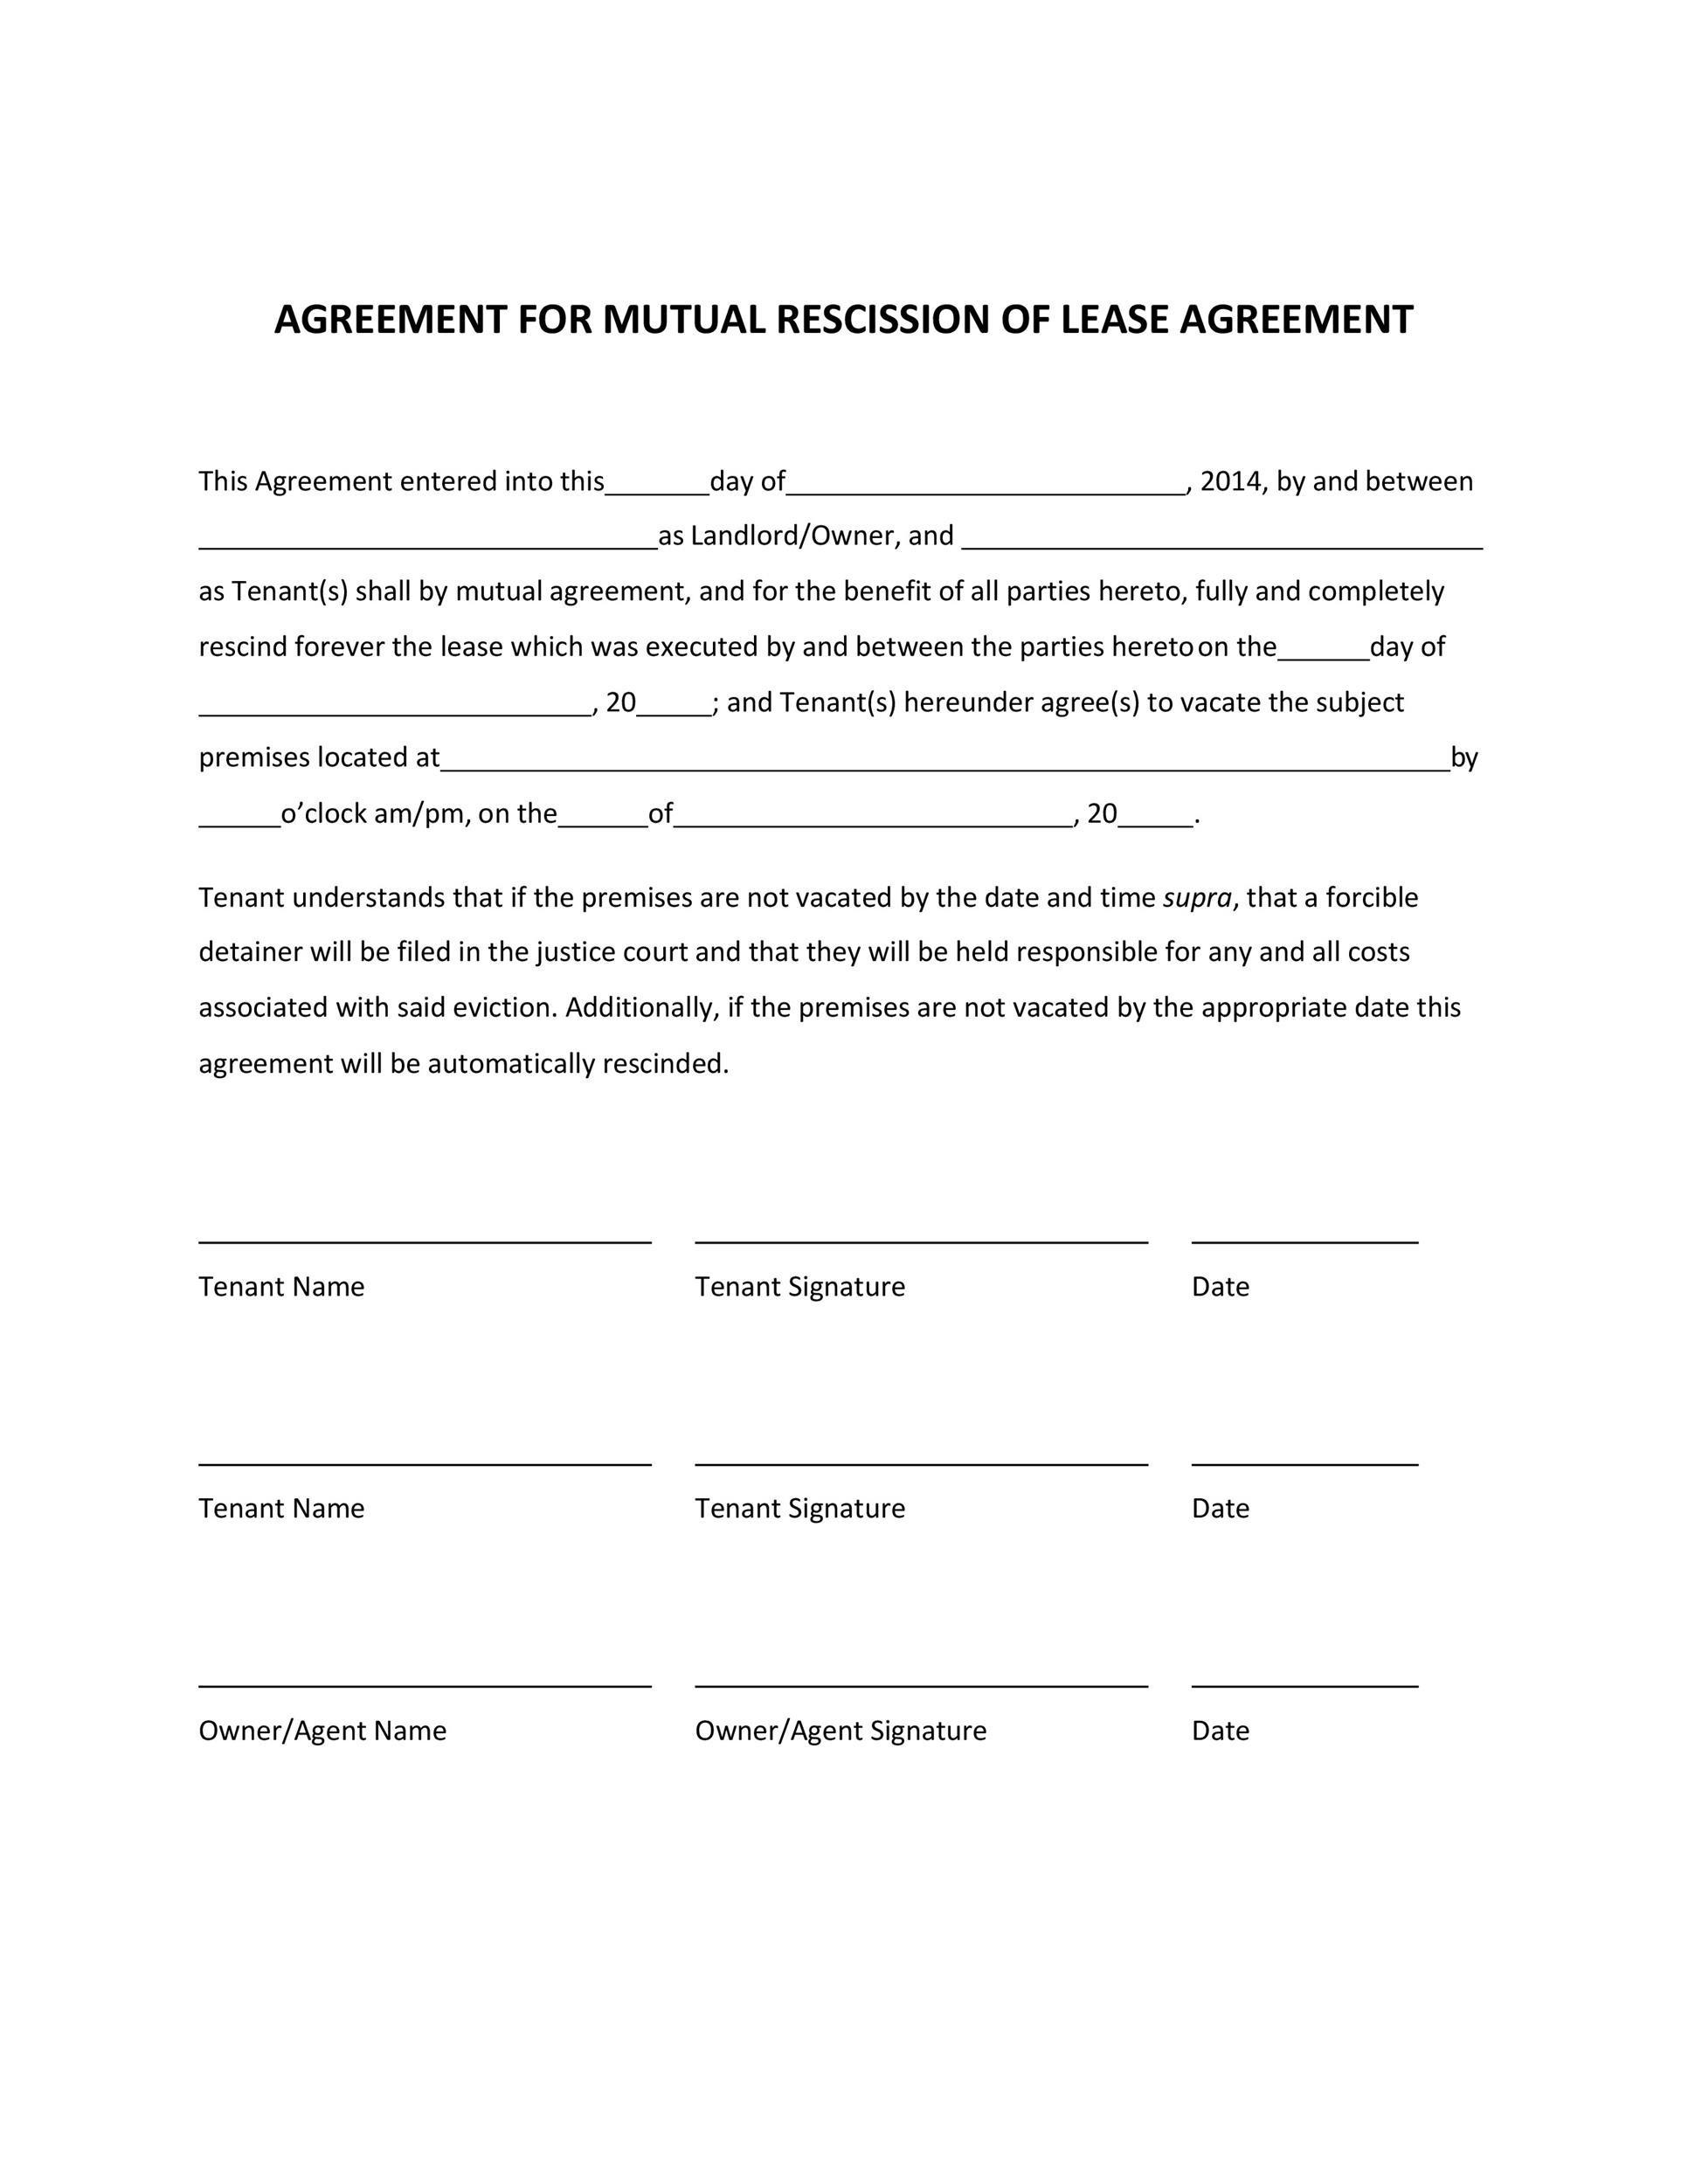 Free rescission agreement 13